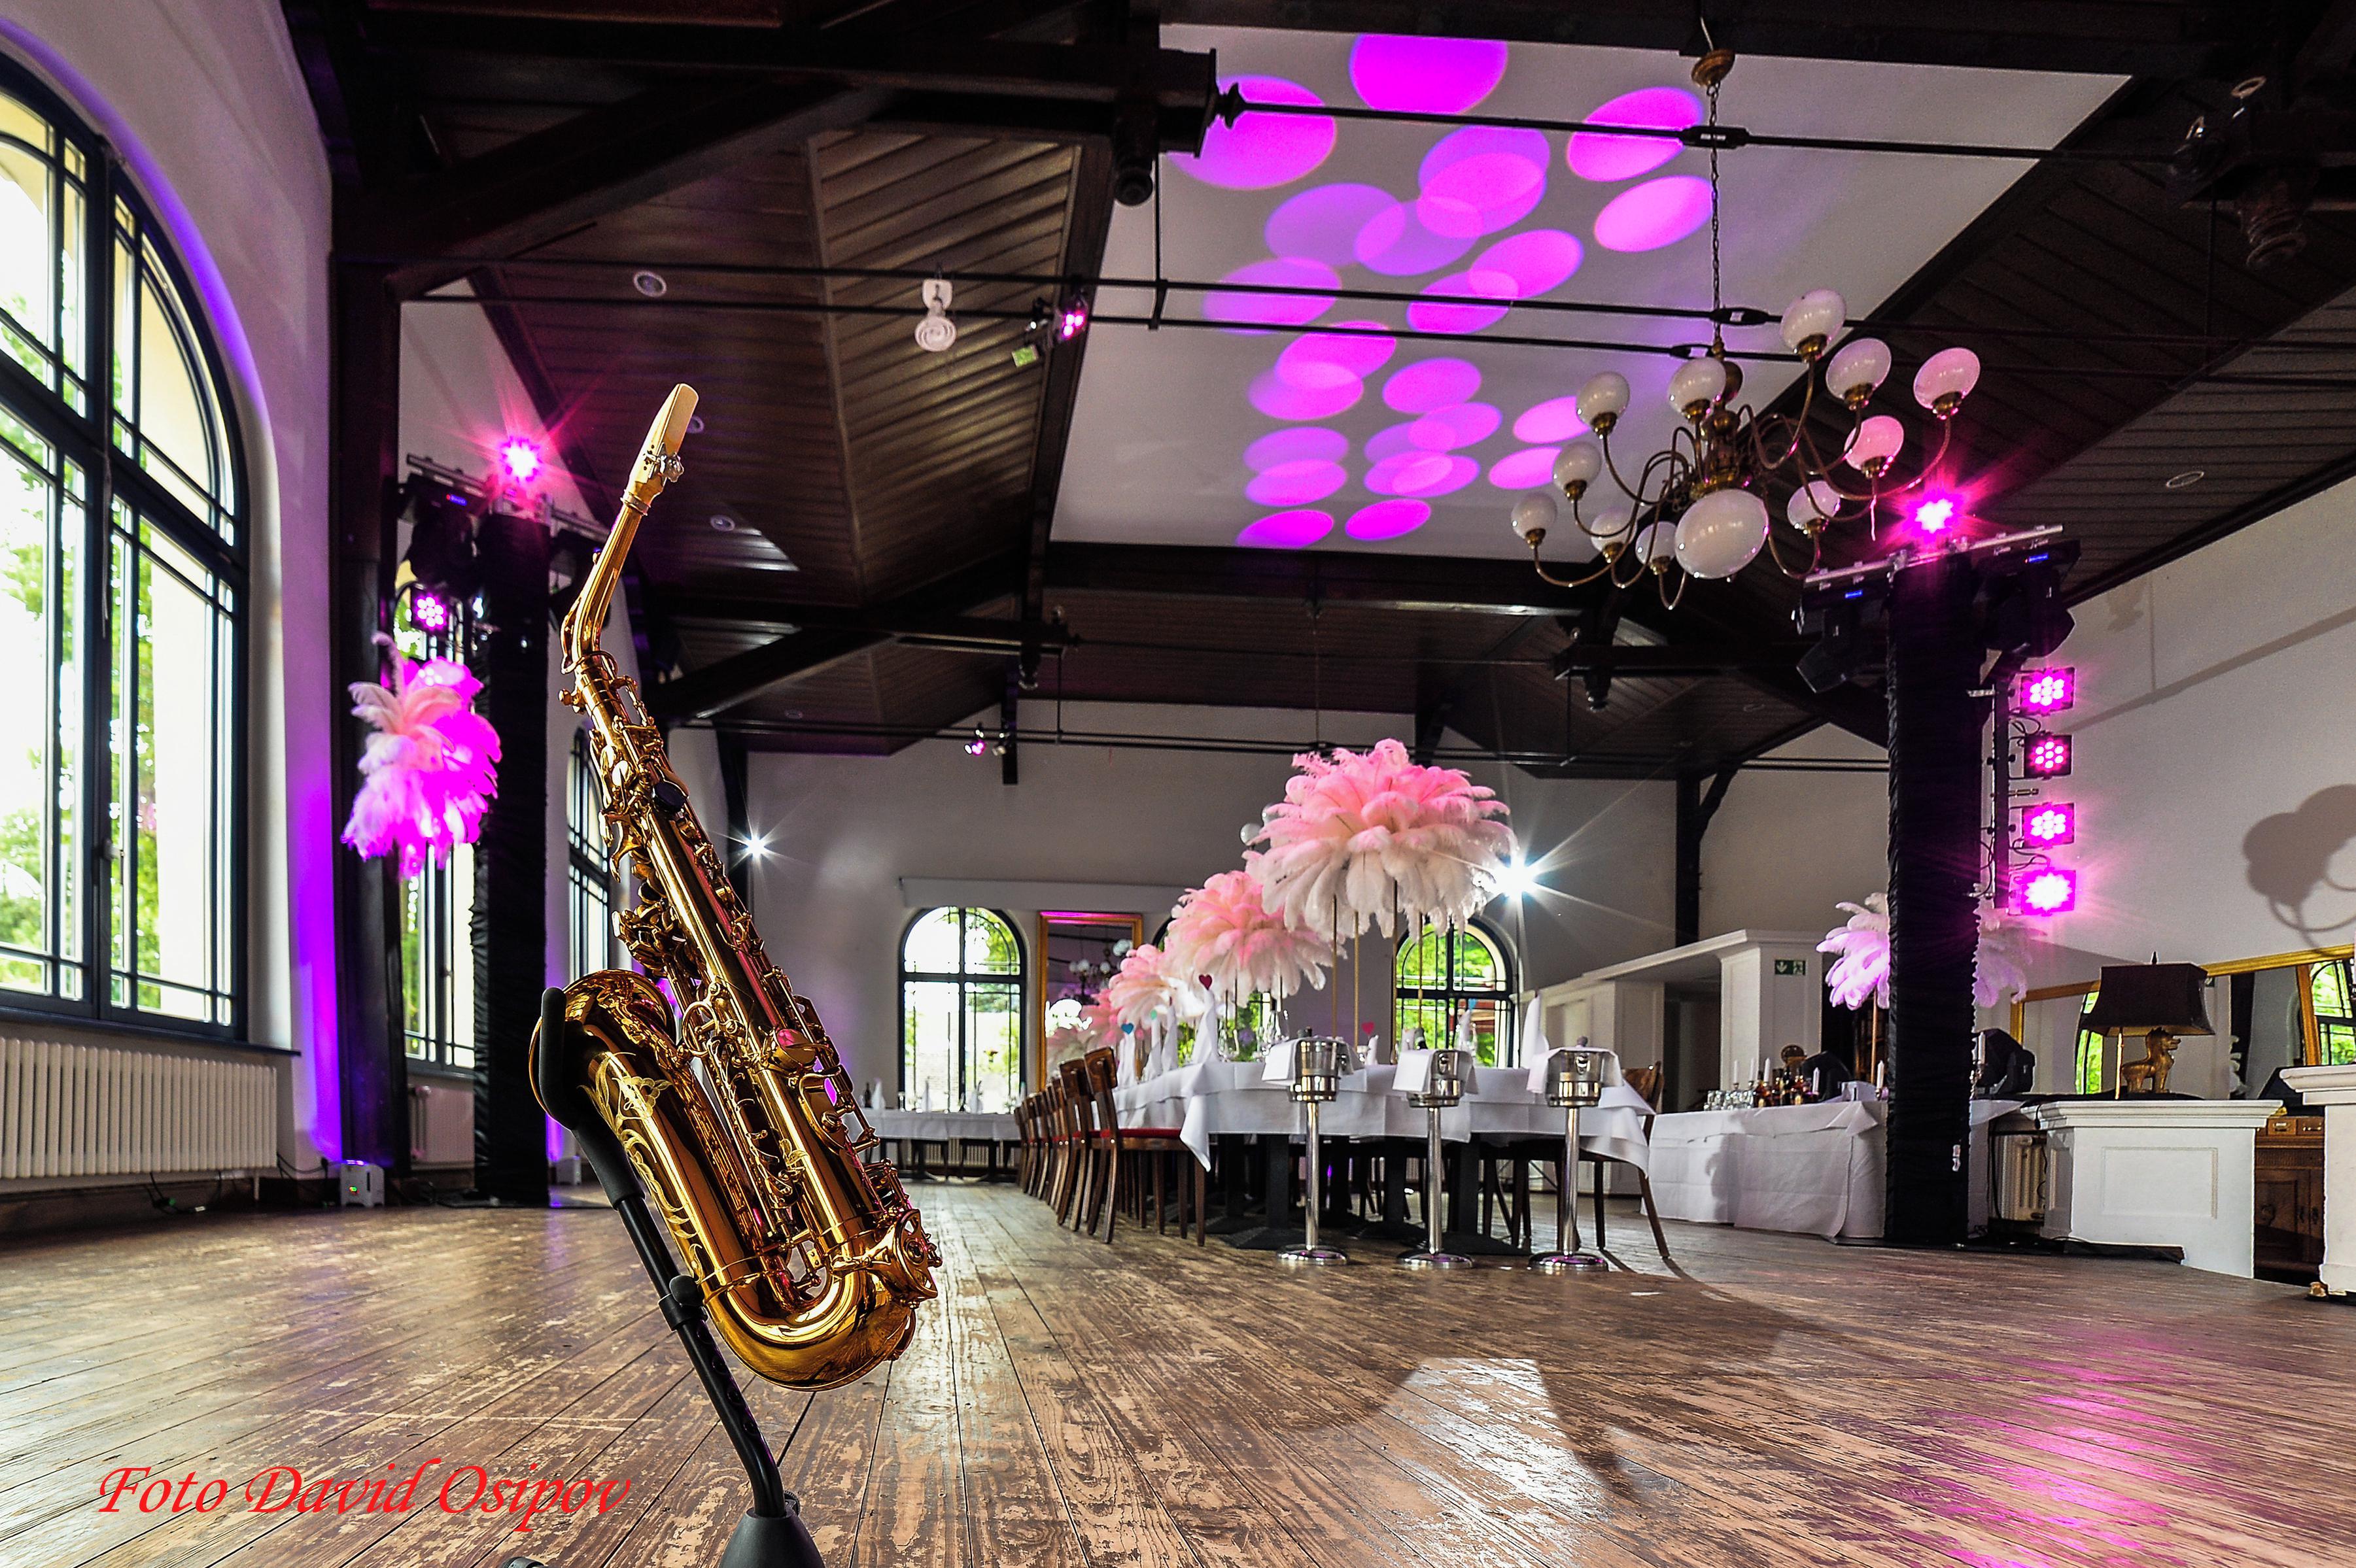 Berlin PR & Marketing Event Hochzeitssaal/Ballsaal/Festsaal  image 5